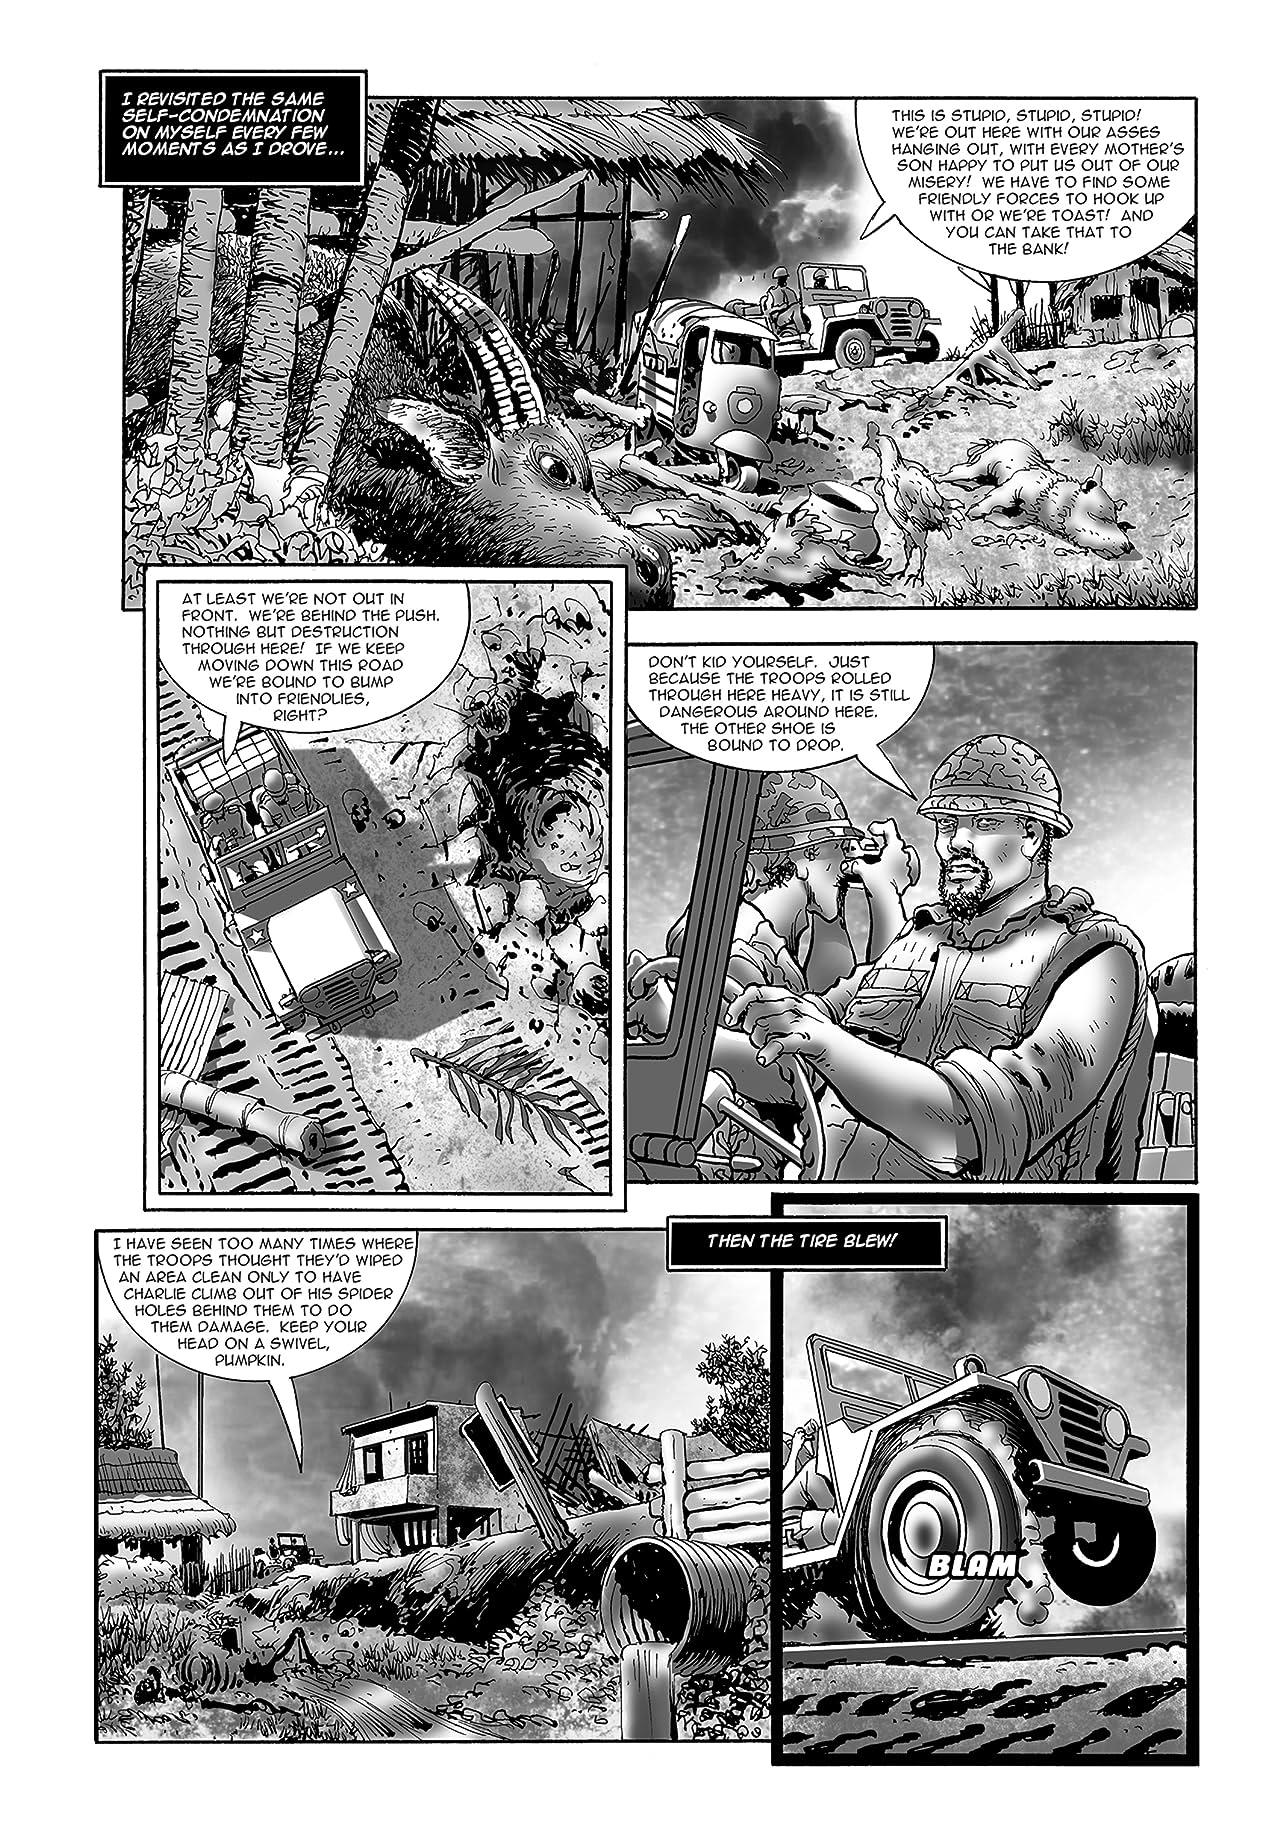 Vietnam Journal: Series Two #6